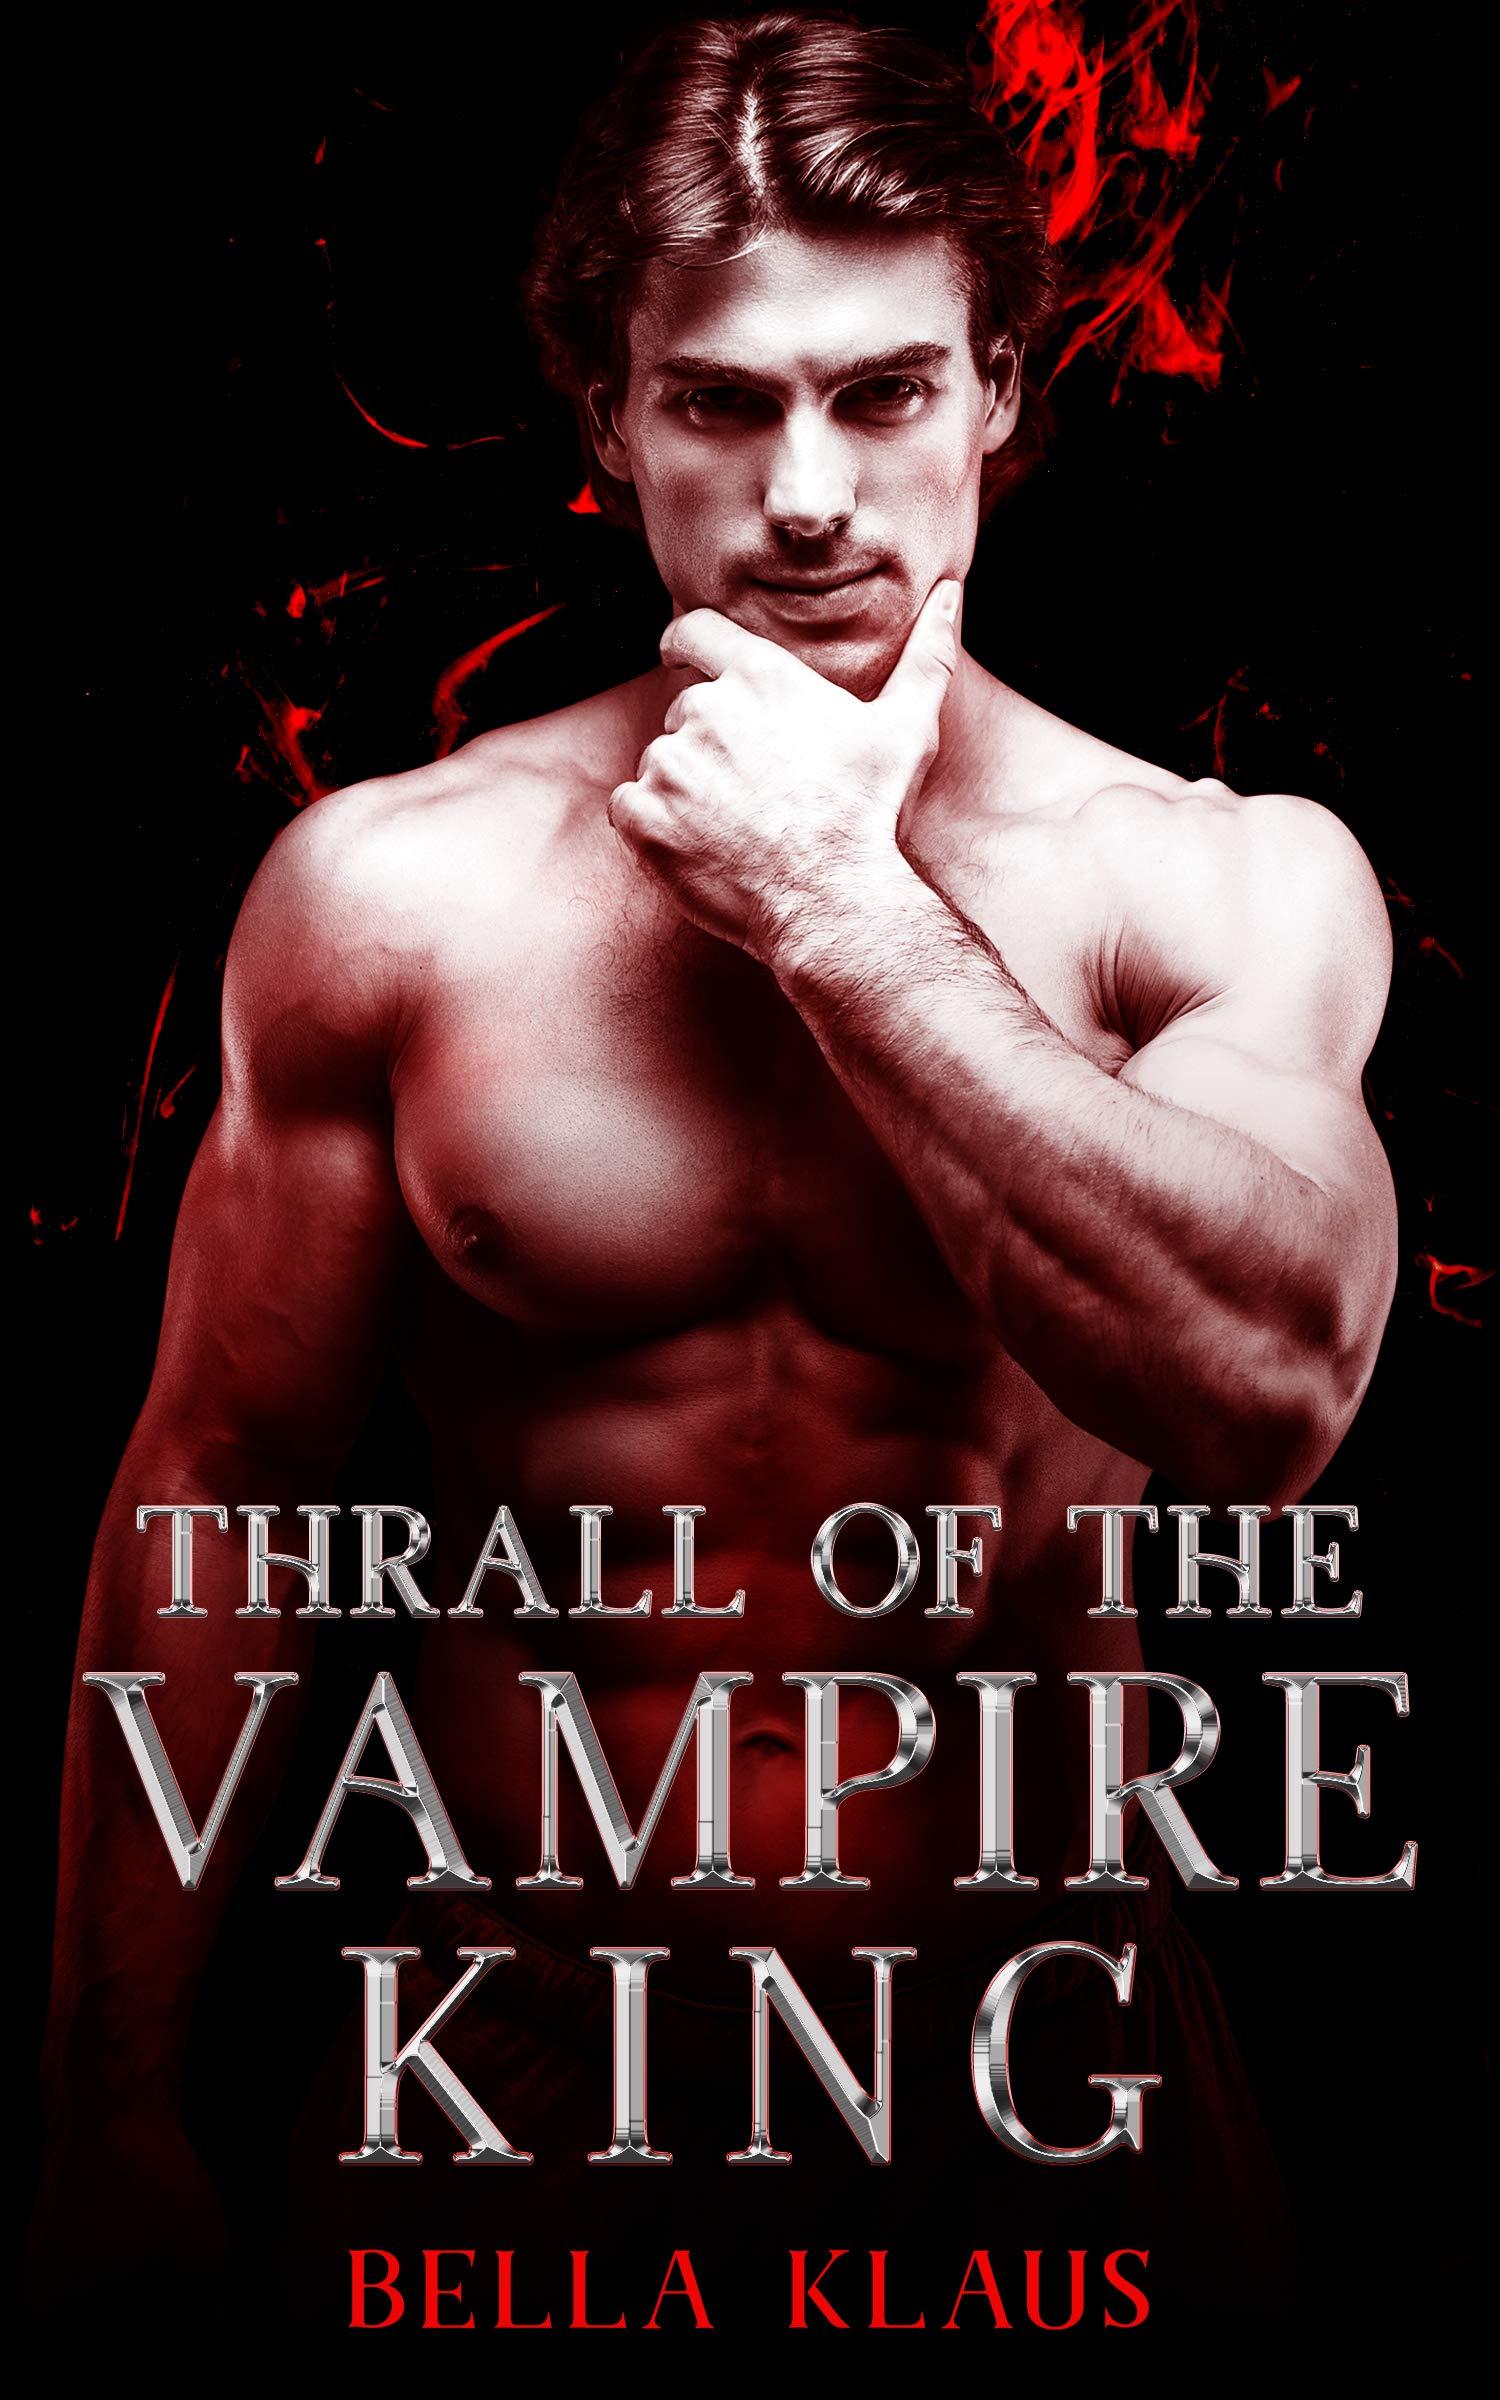 Thrall of the Vampire King (Blood Fire Saga #4)